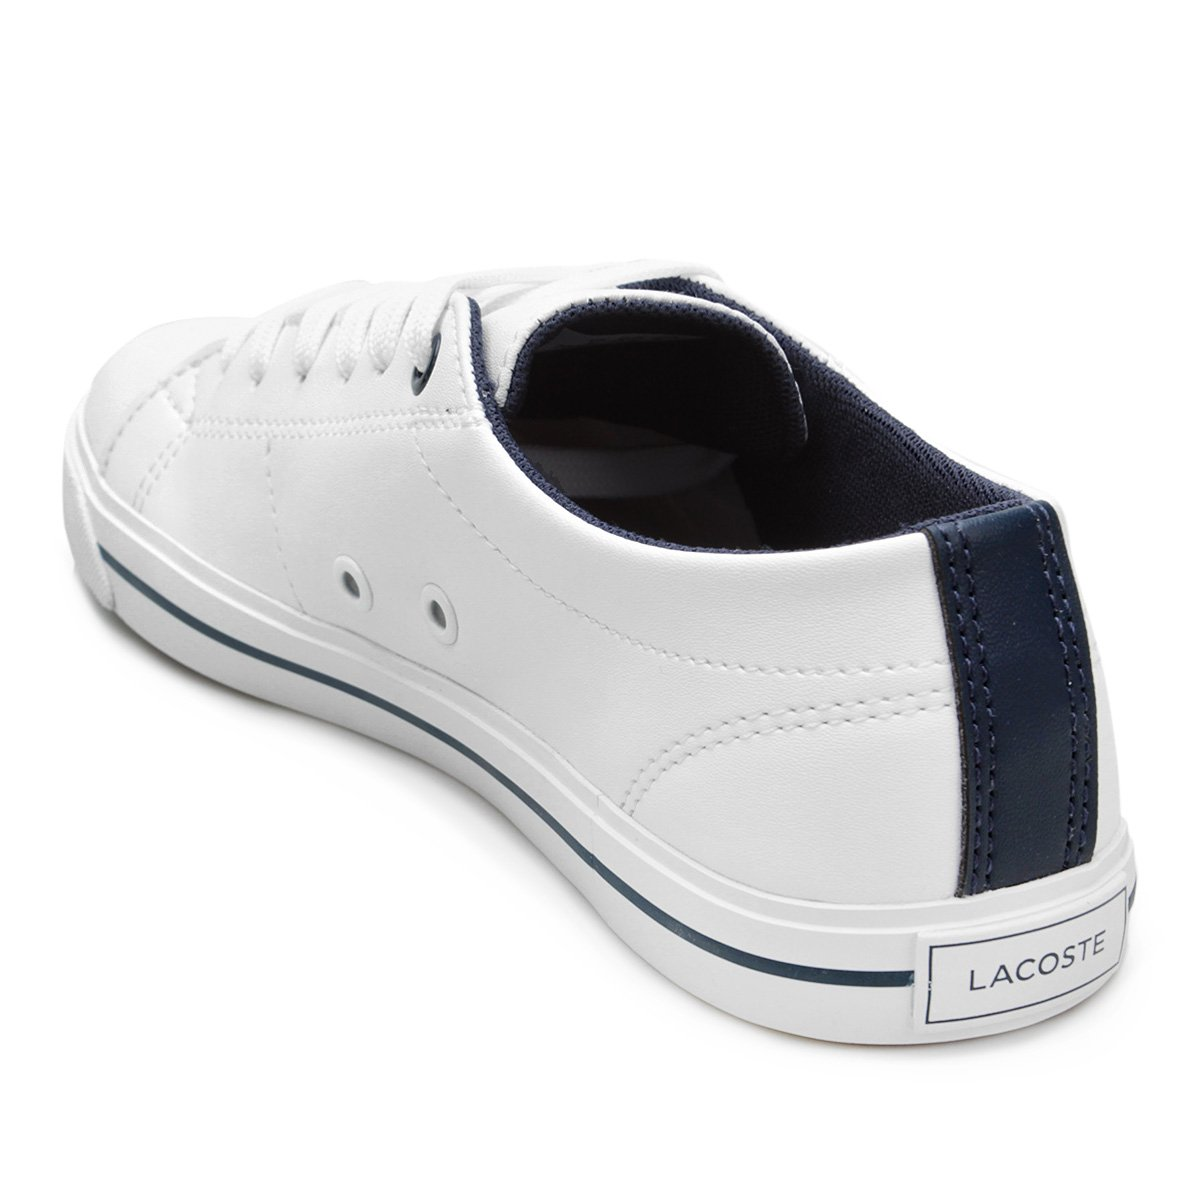 Tênis Infantil Lacoste Riberac 417 Masculino - Branco - Compre Agora ... e708b1abf5